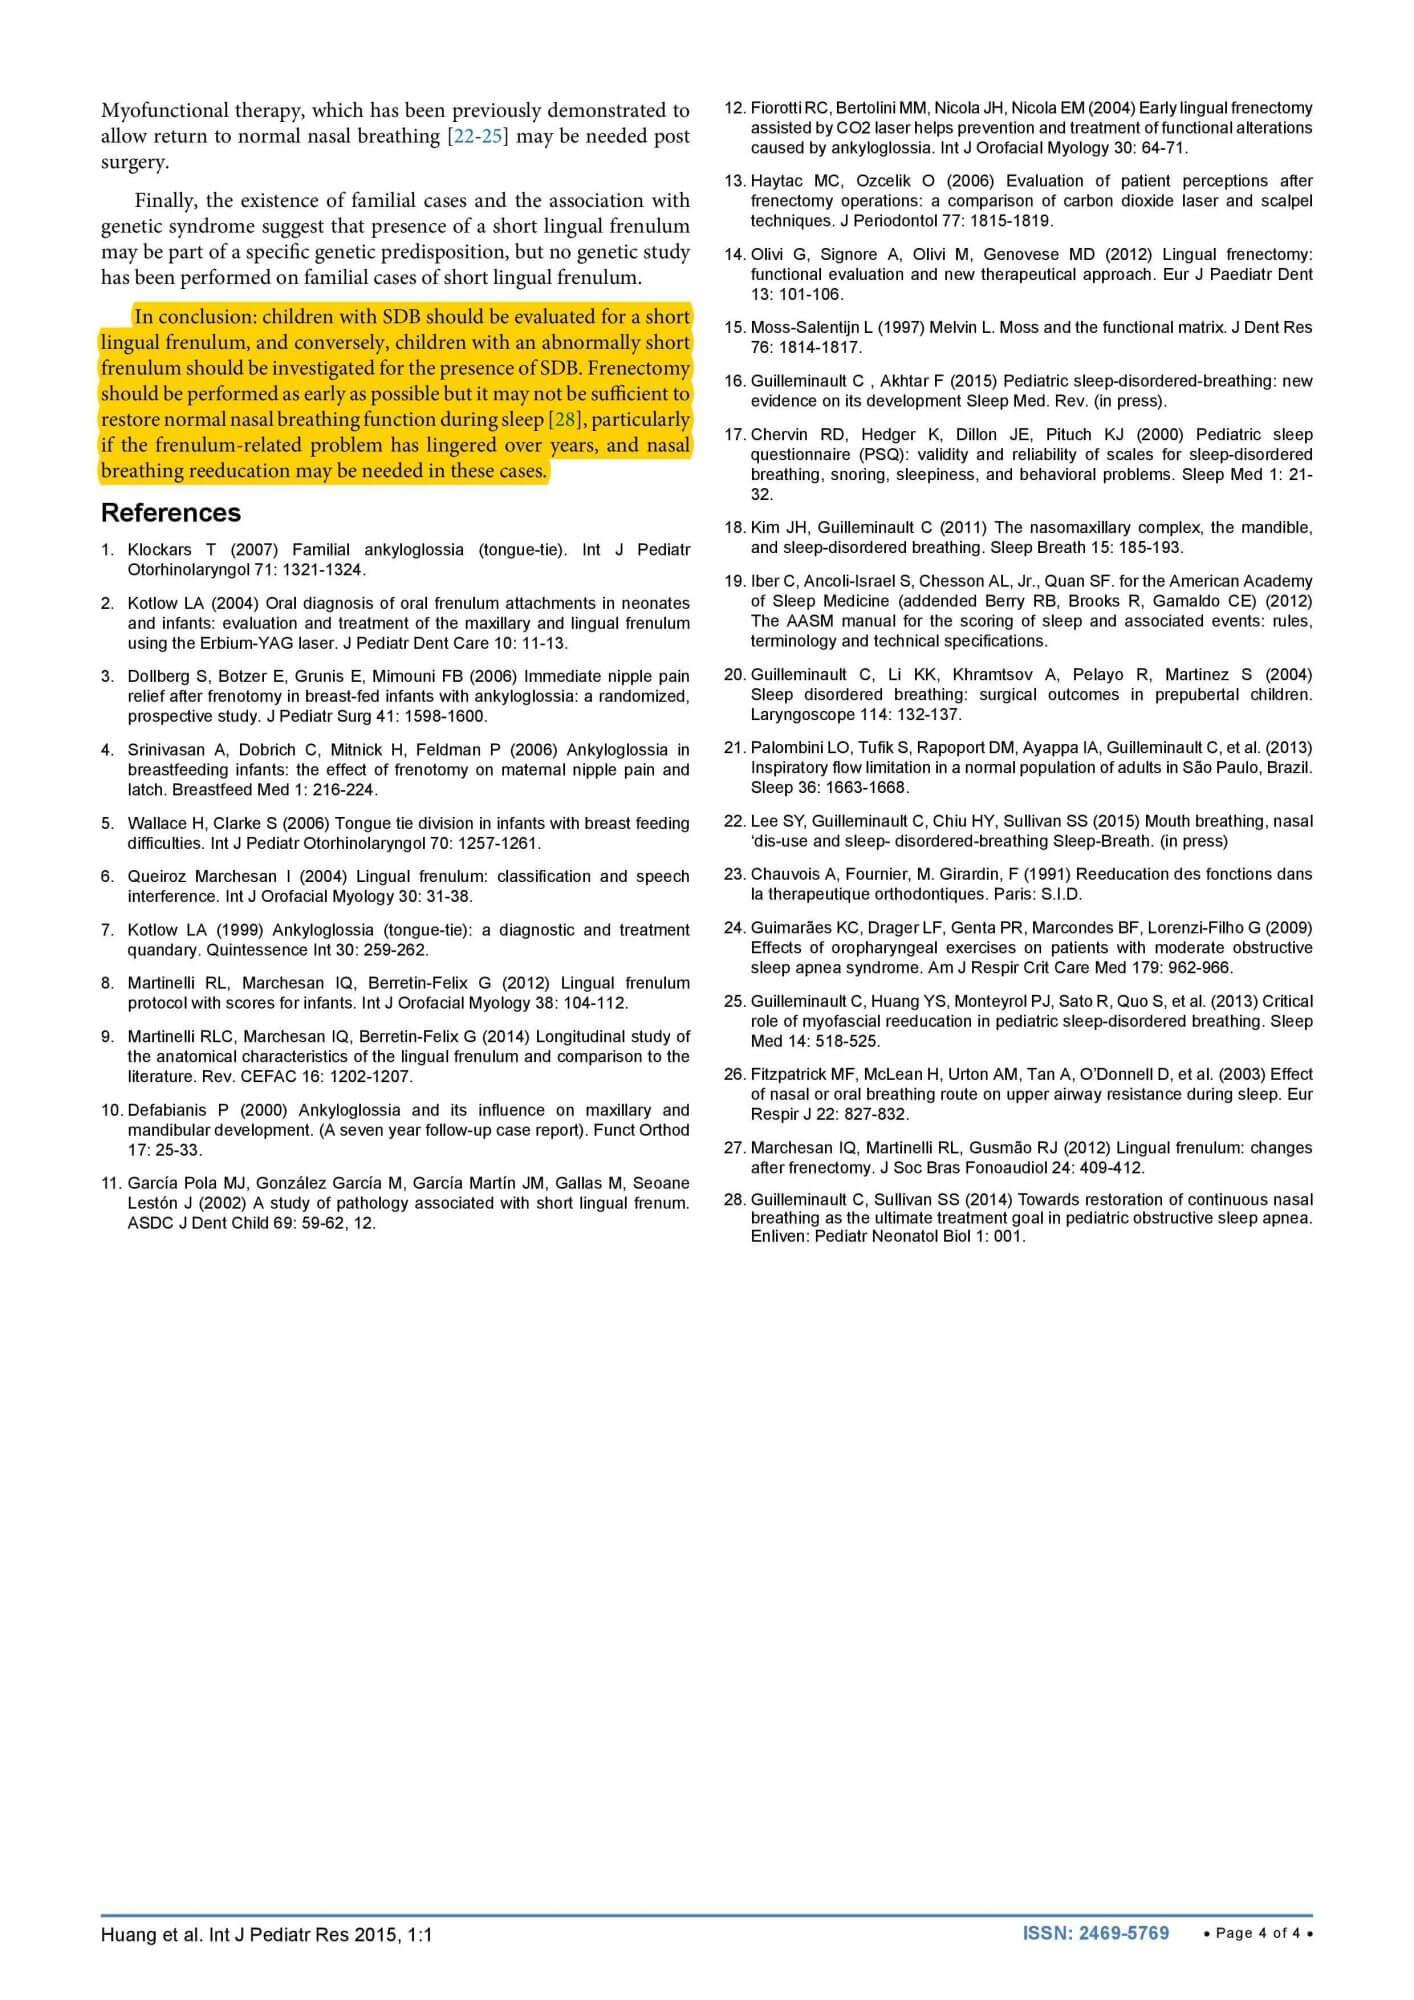 Short Lingual Frenulum and Obstructive Sleep Apnea in Children-4